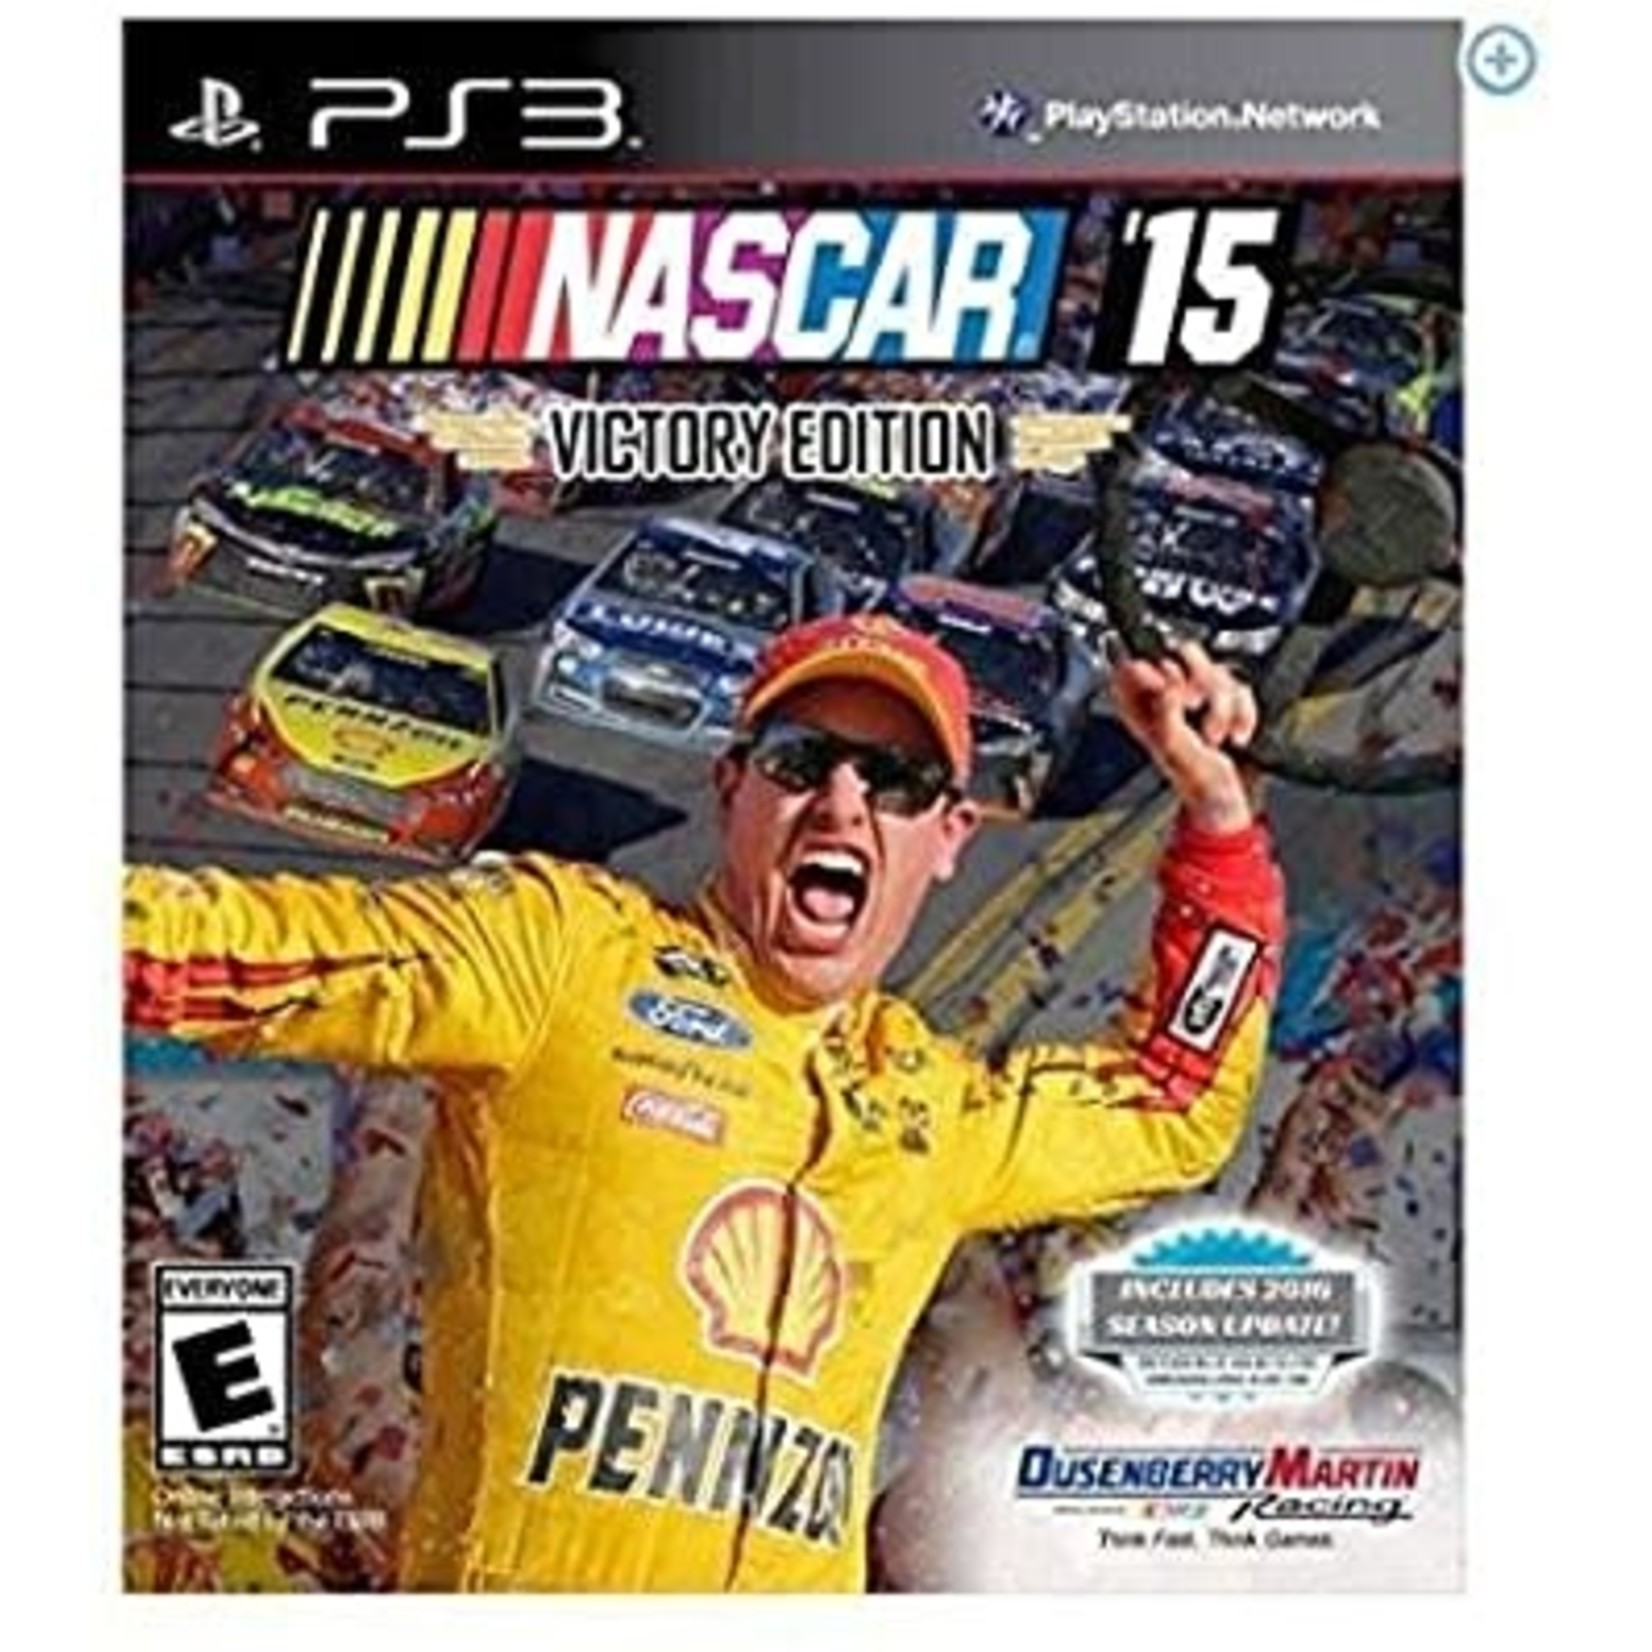 PS3U-NASCAR 15